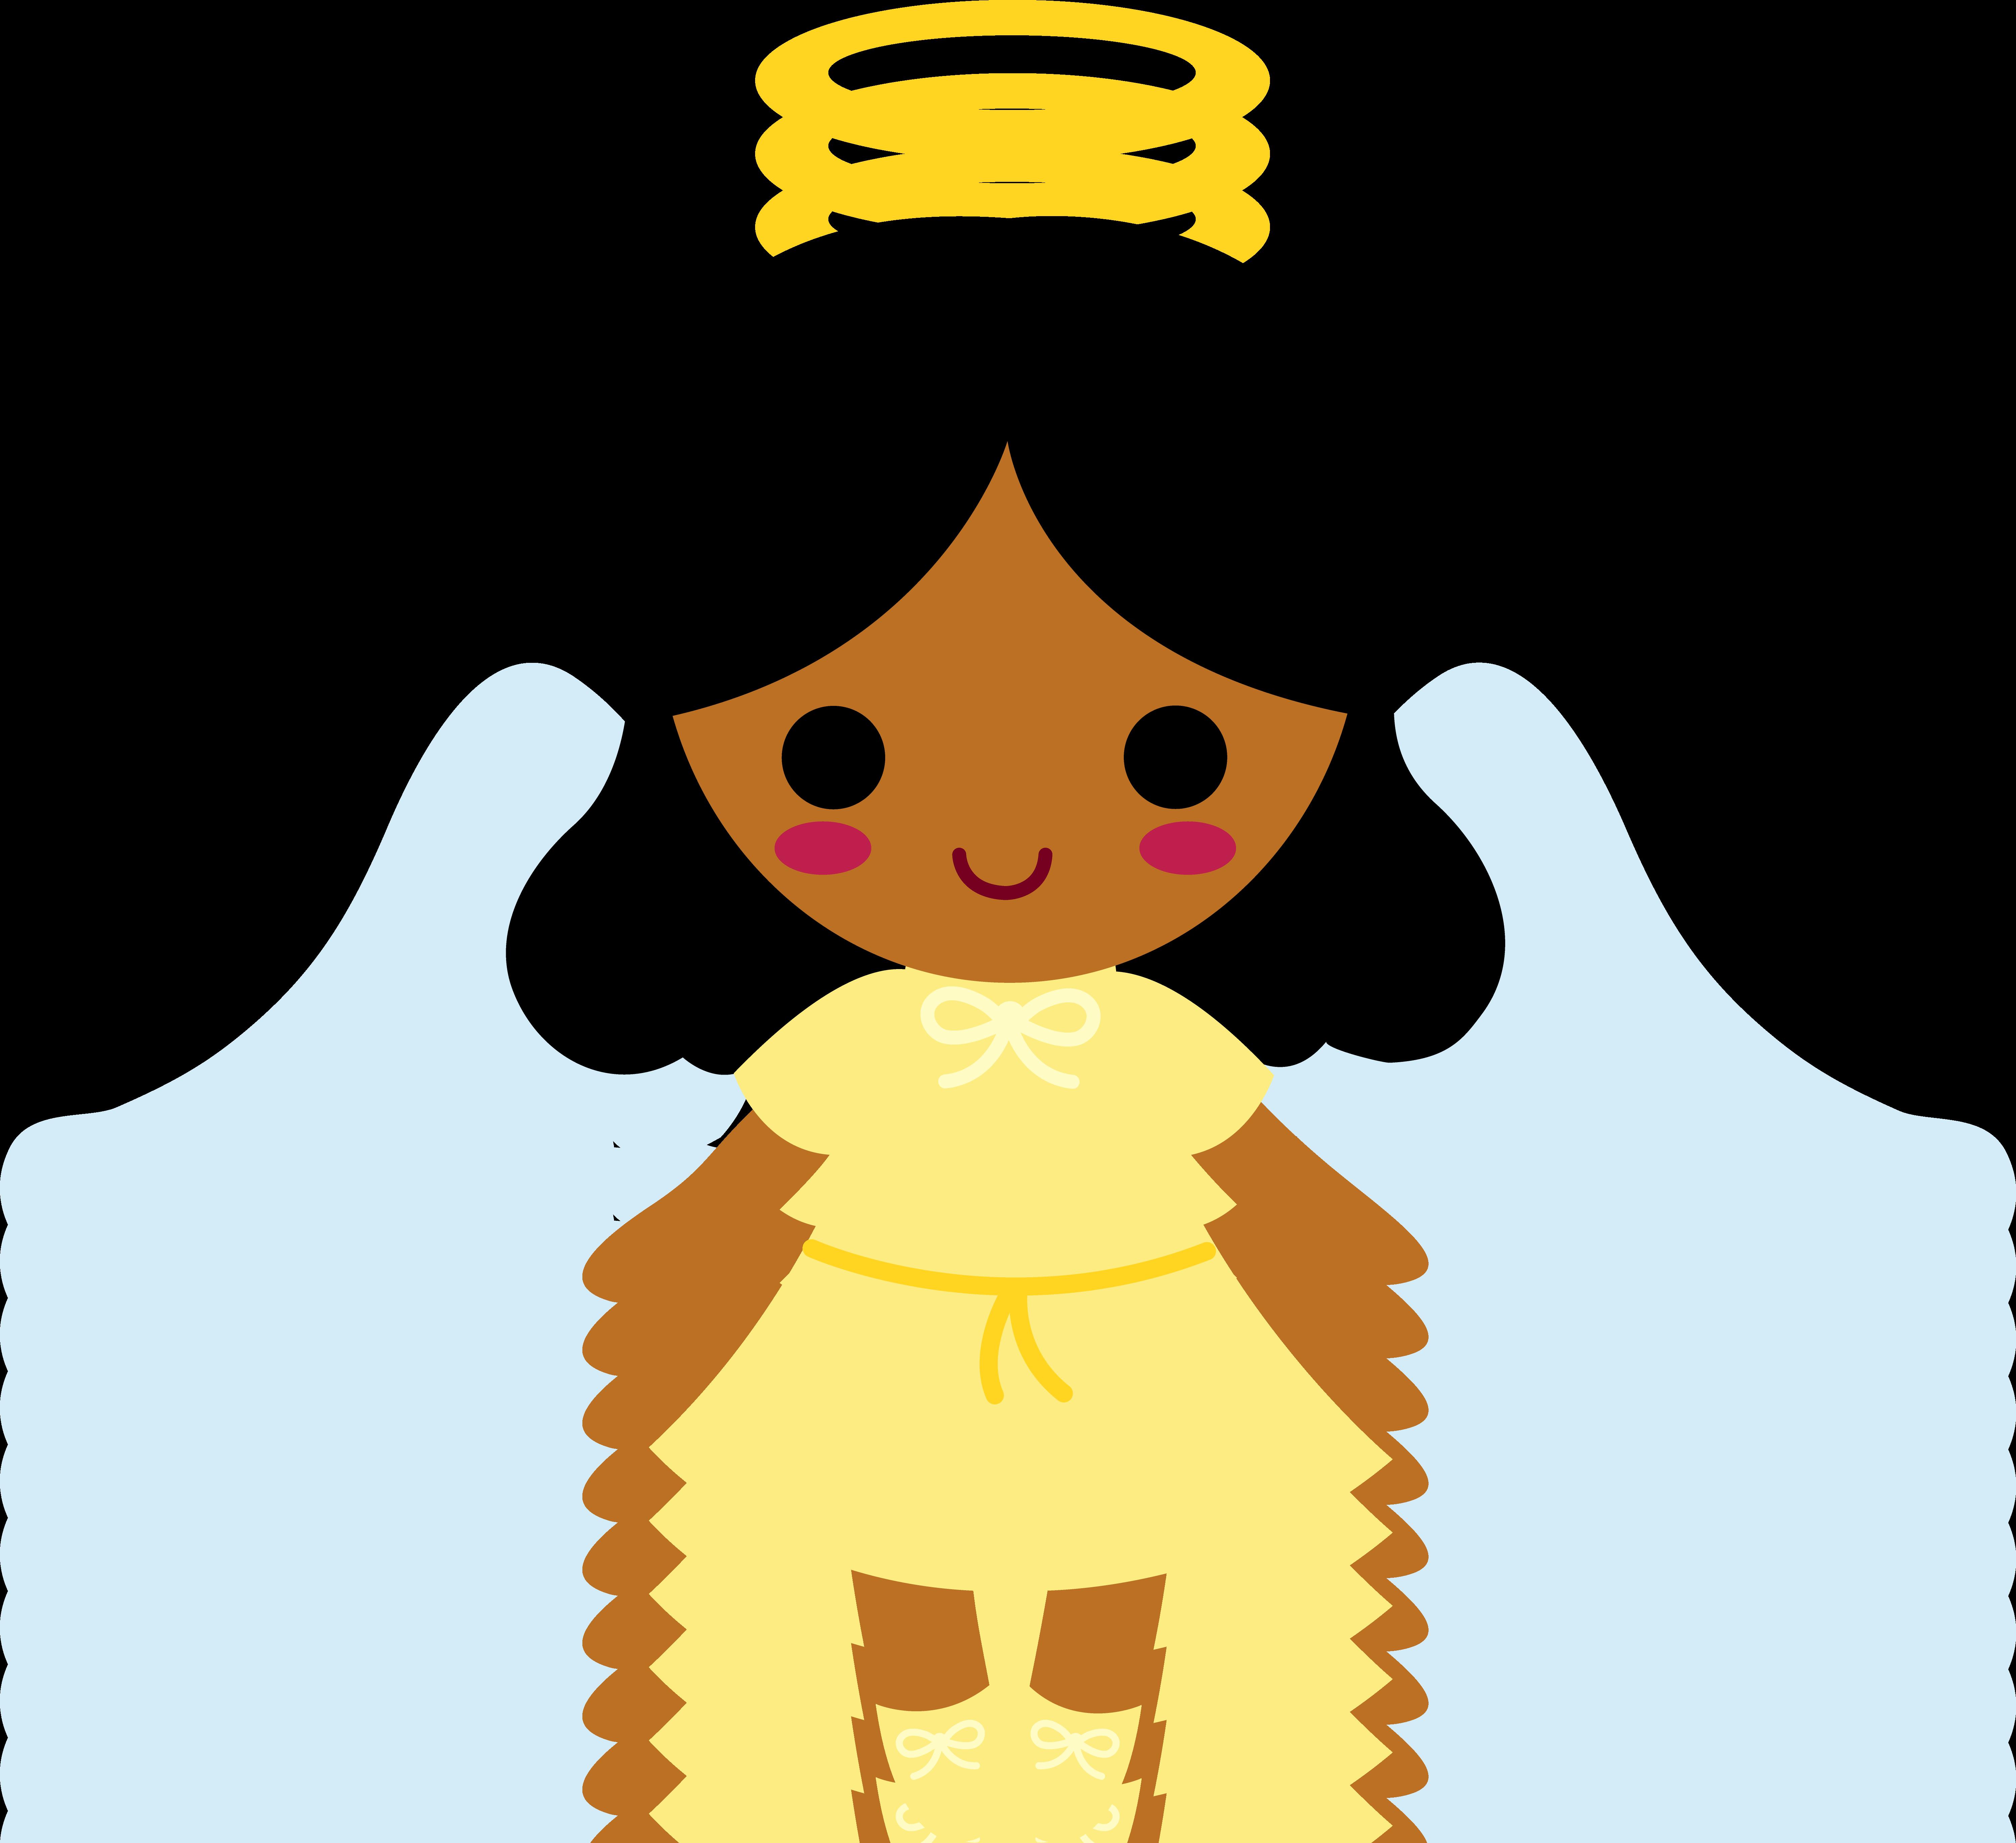 Cartoon Angel Image Free-Cartoon Angel Image Free-12